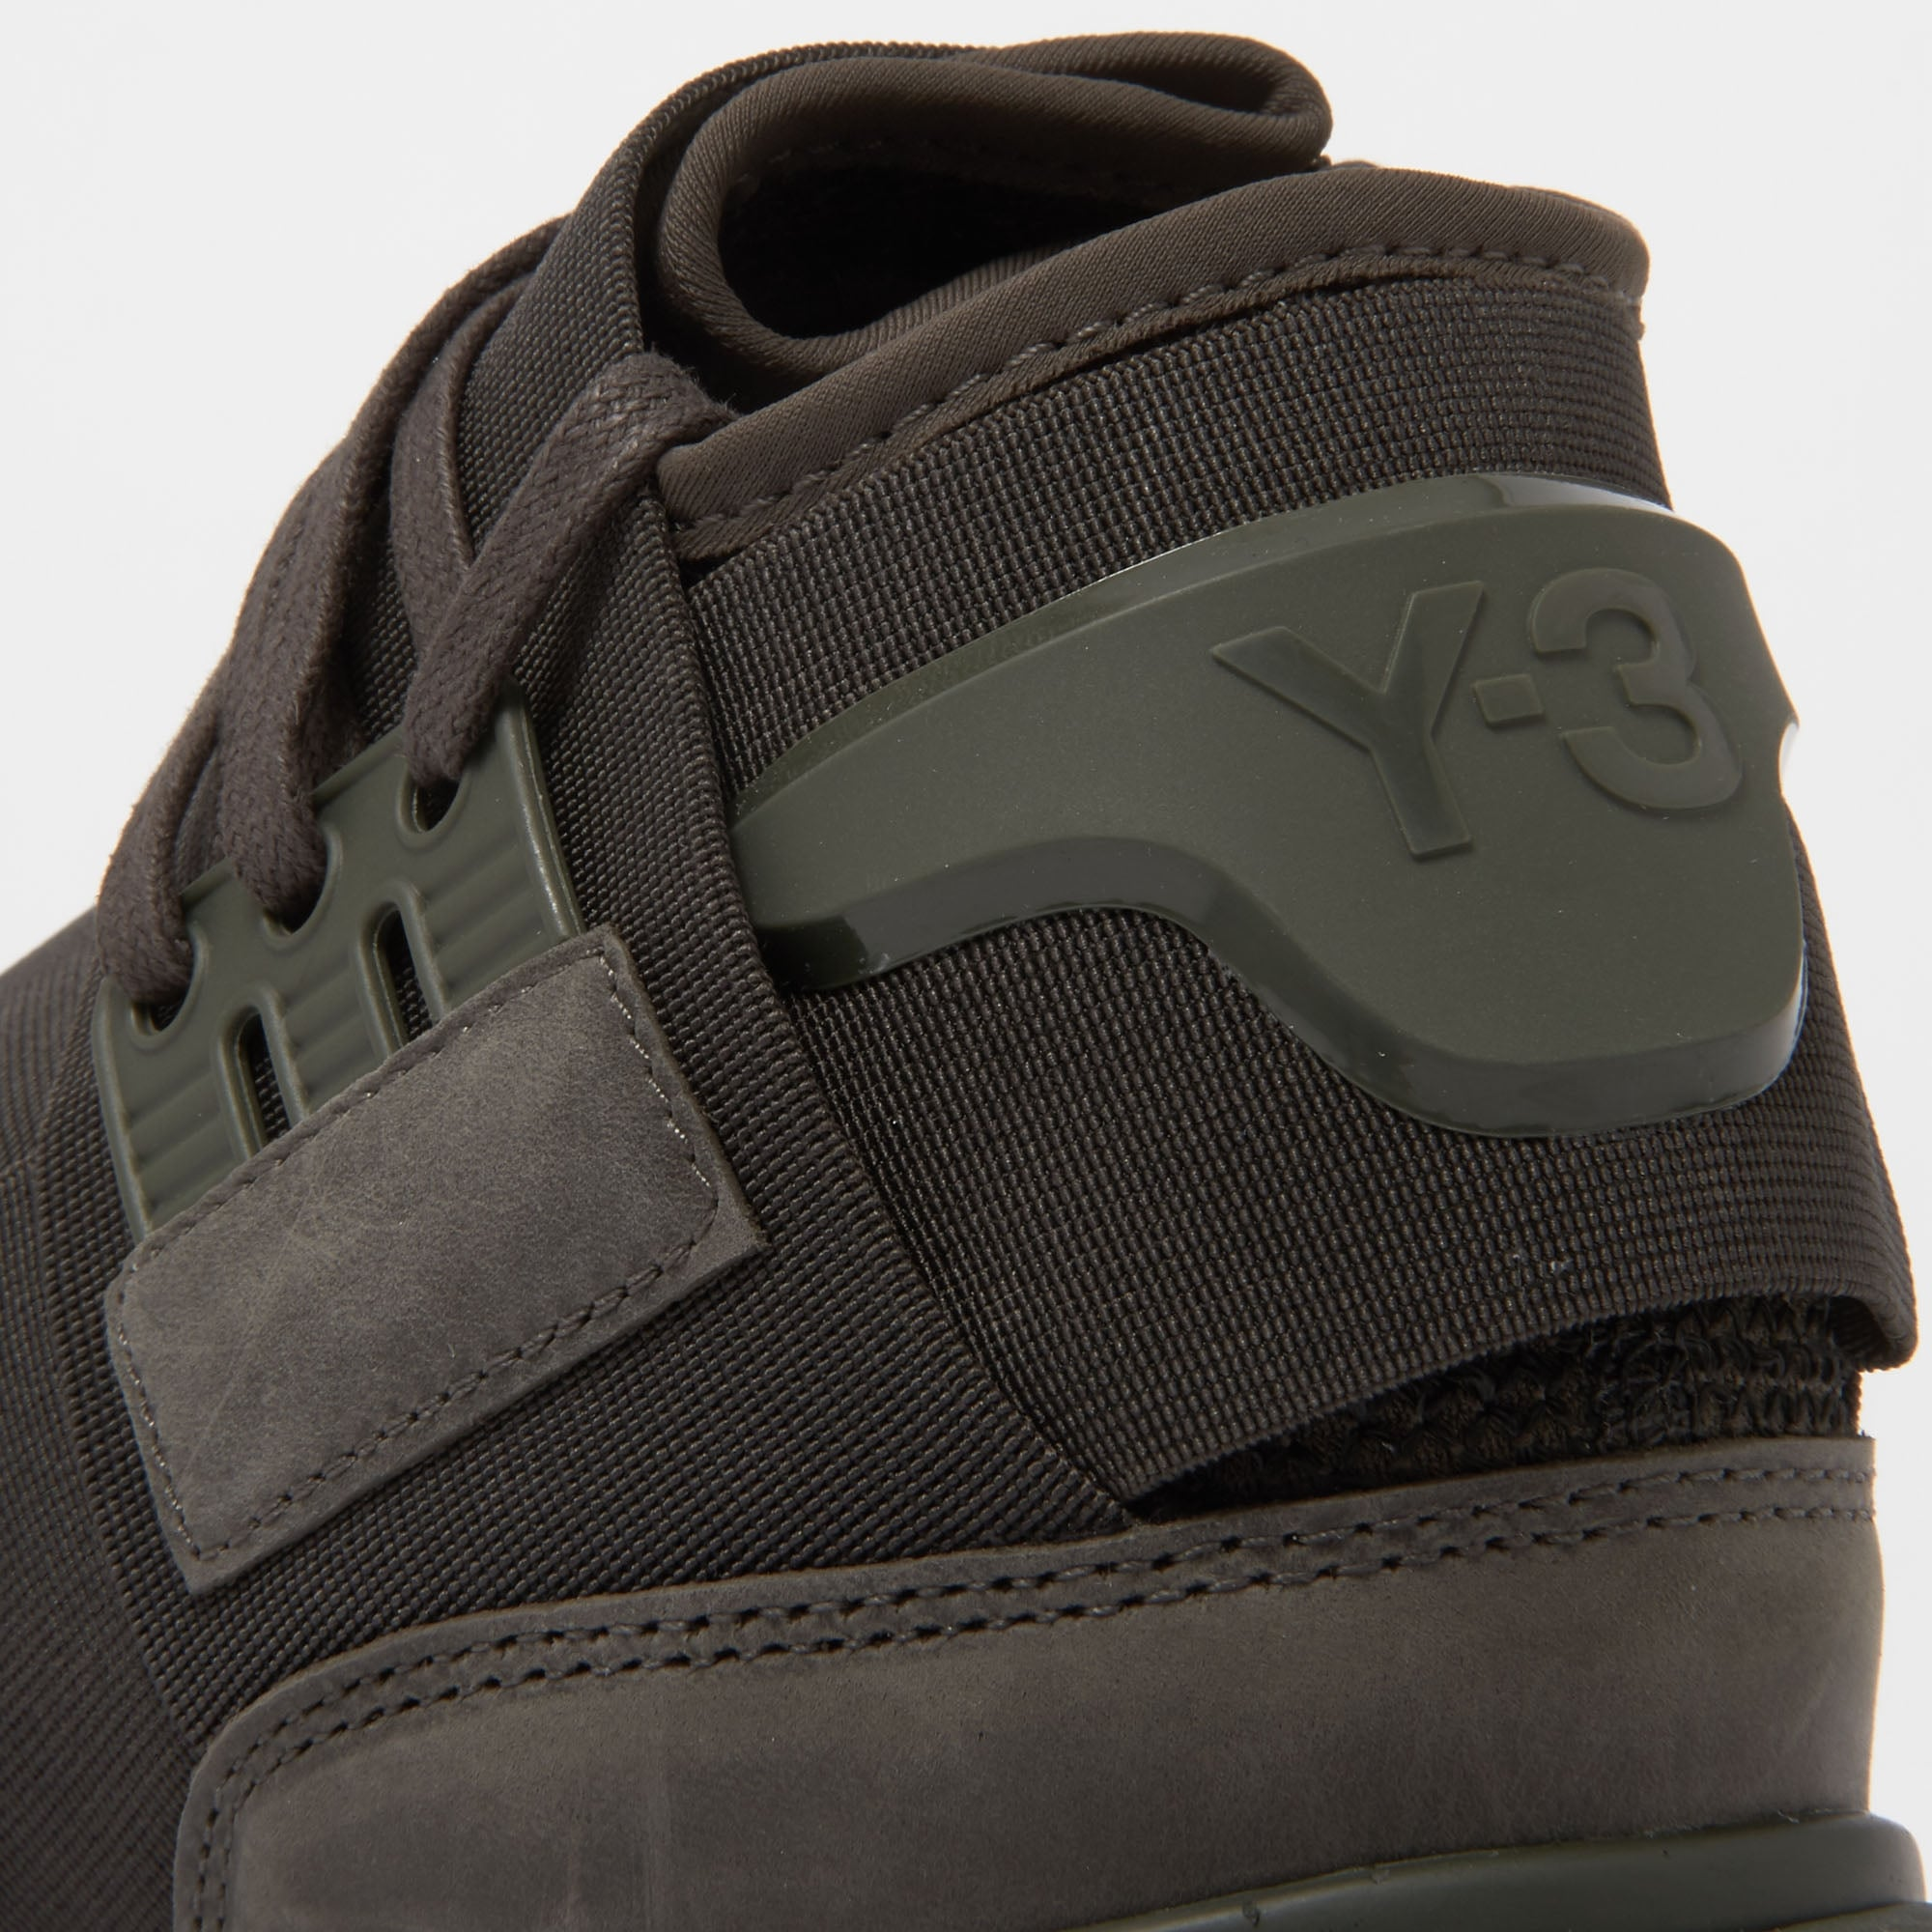 3bc5da8646dd ... Adidas Y-3 Qasa High. Tap image to zoom. Qasa High Black Olive Sneakers  CG3194